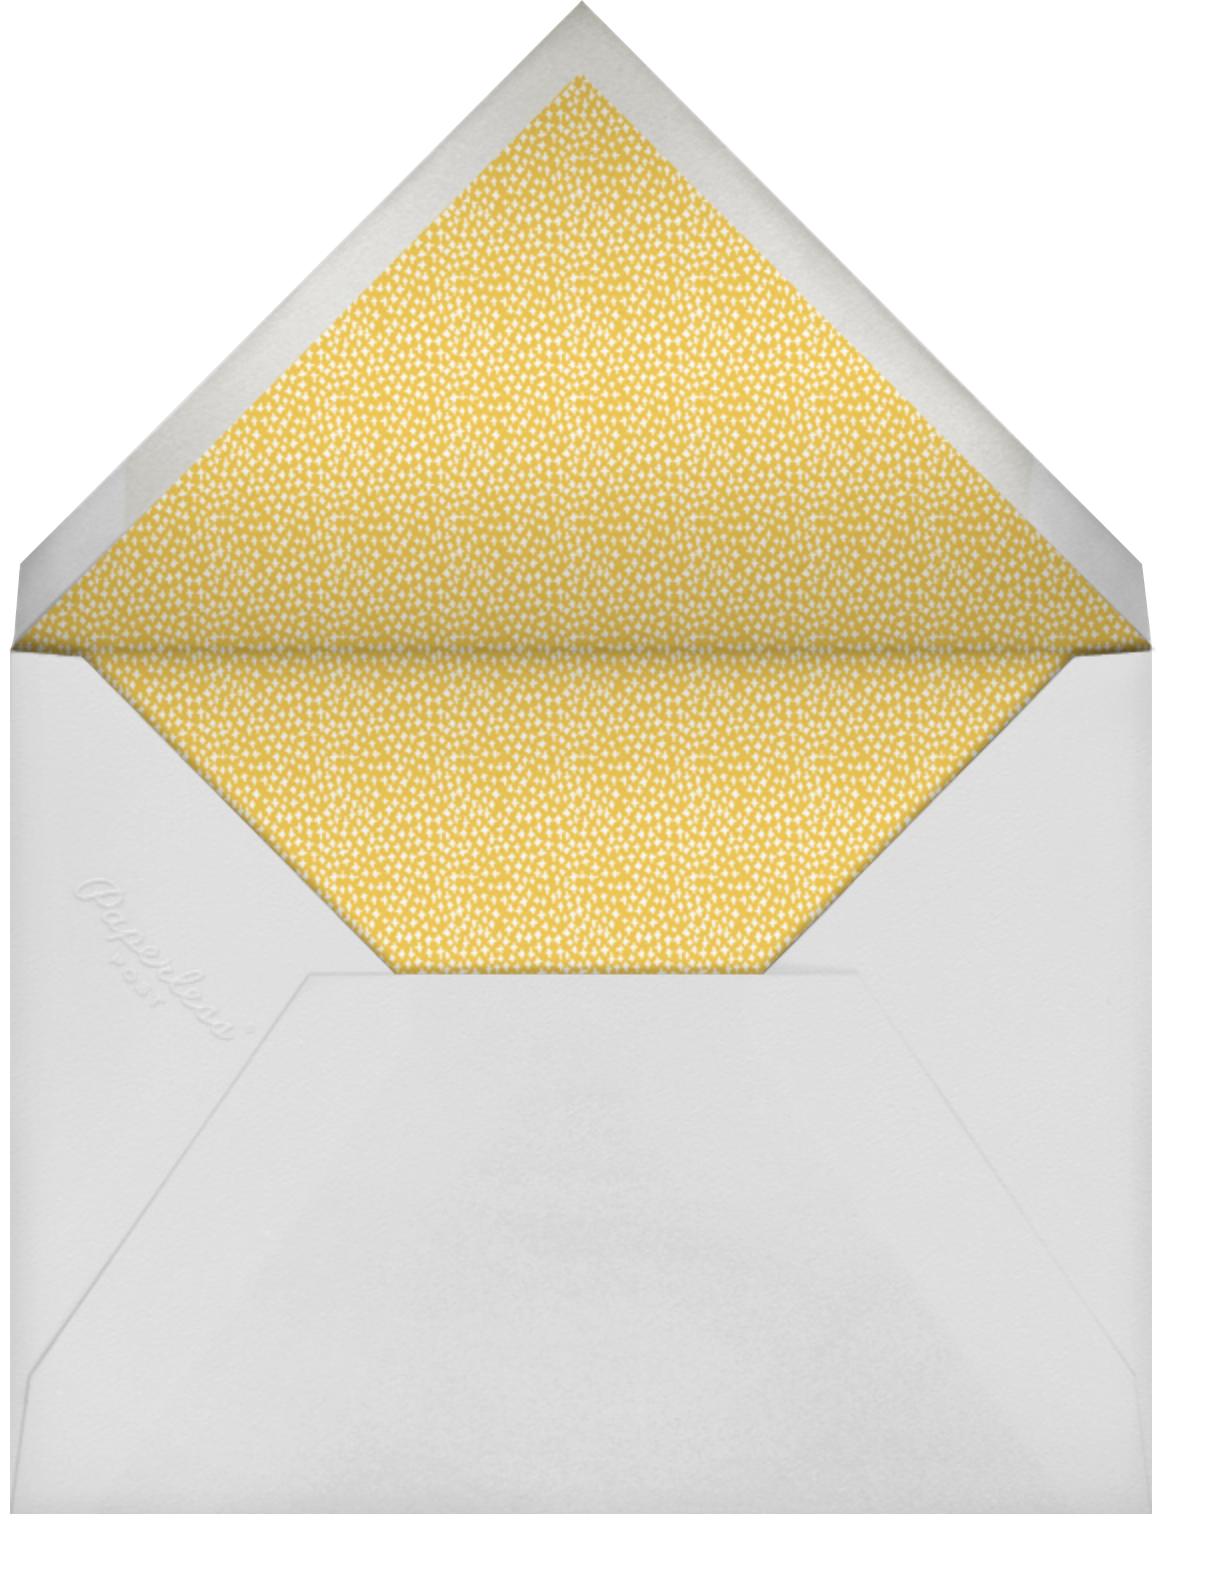 My Perception's Clouded - Mr. Boddington's Studio - Baby shower - envelope back